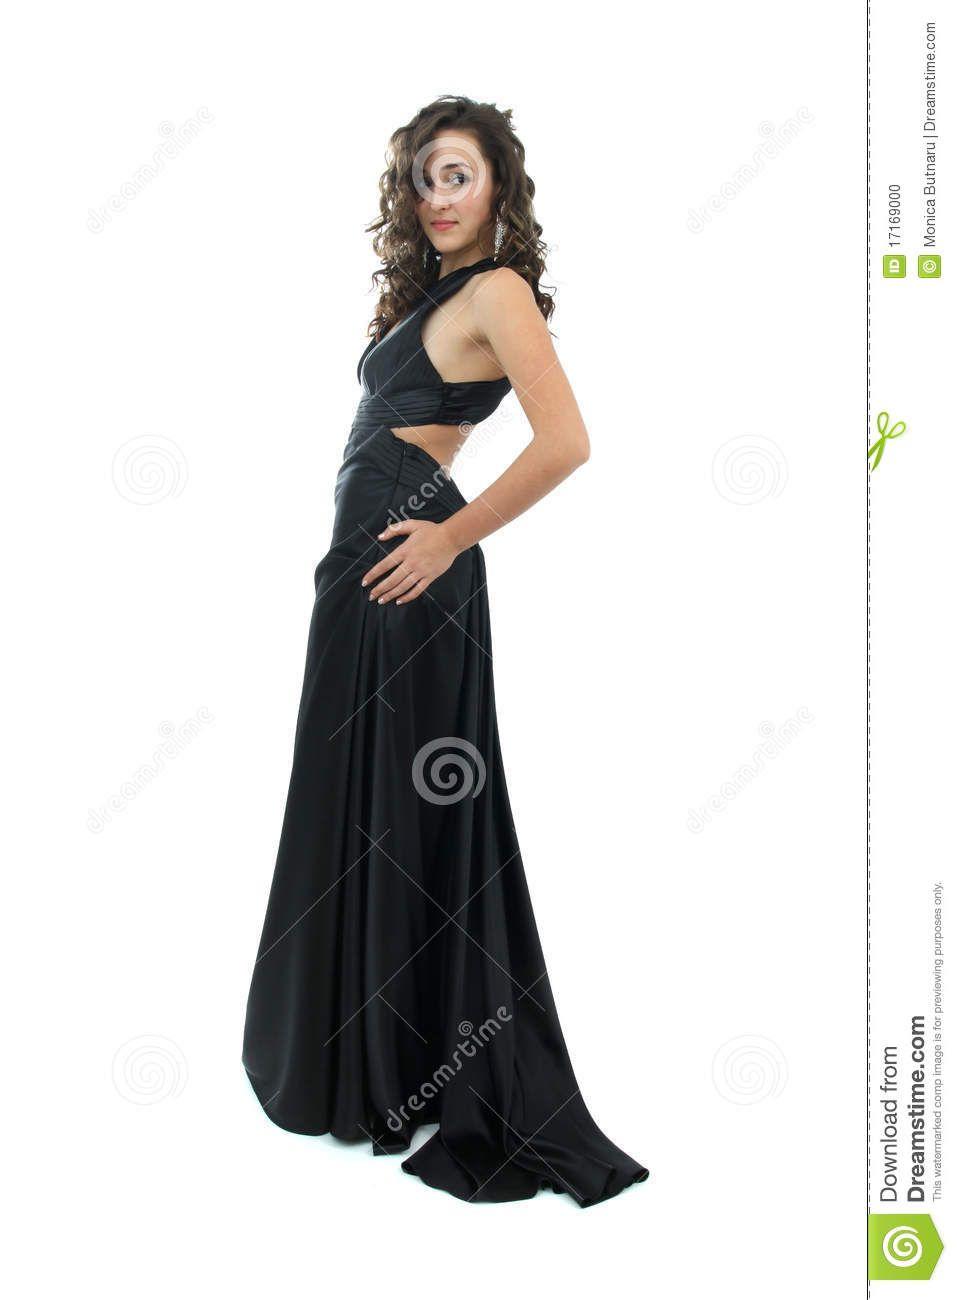 Women in Elegant Gowns | Attractive young woman in elegant black ...